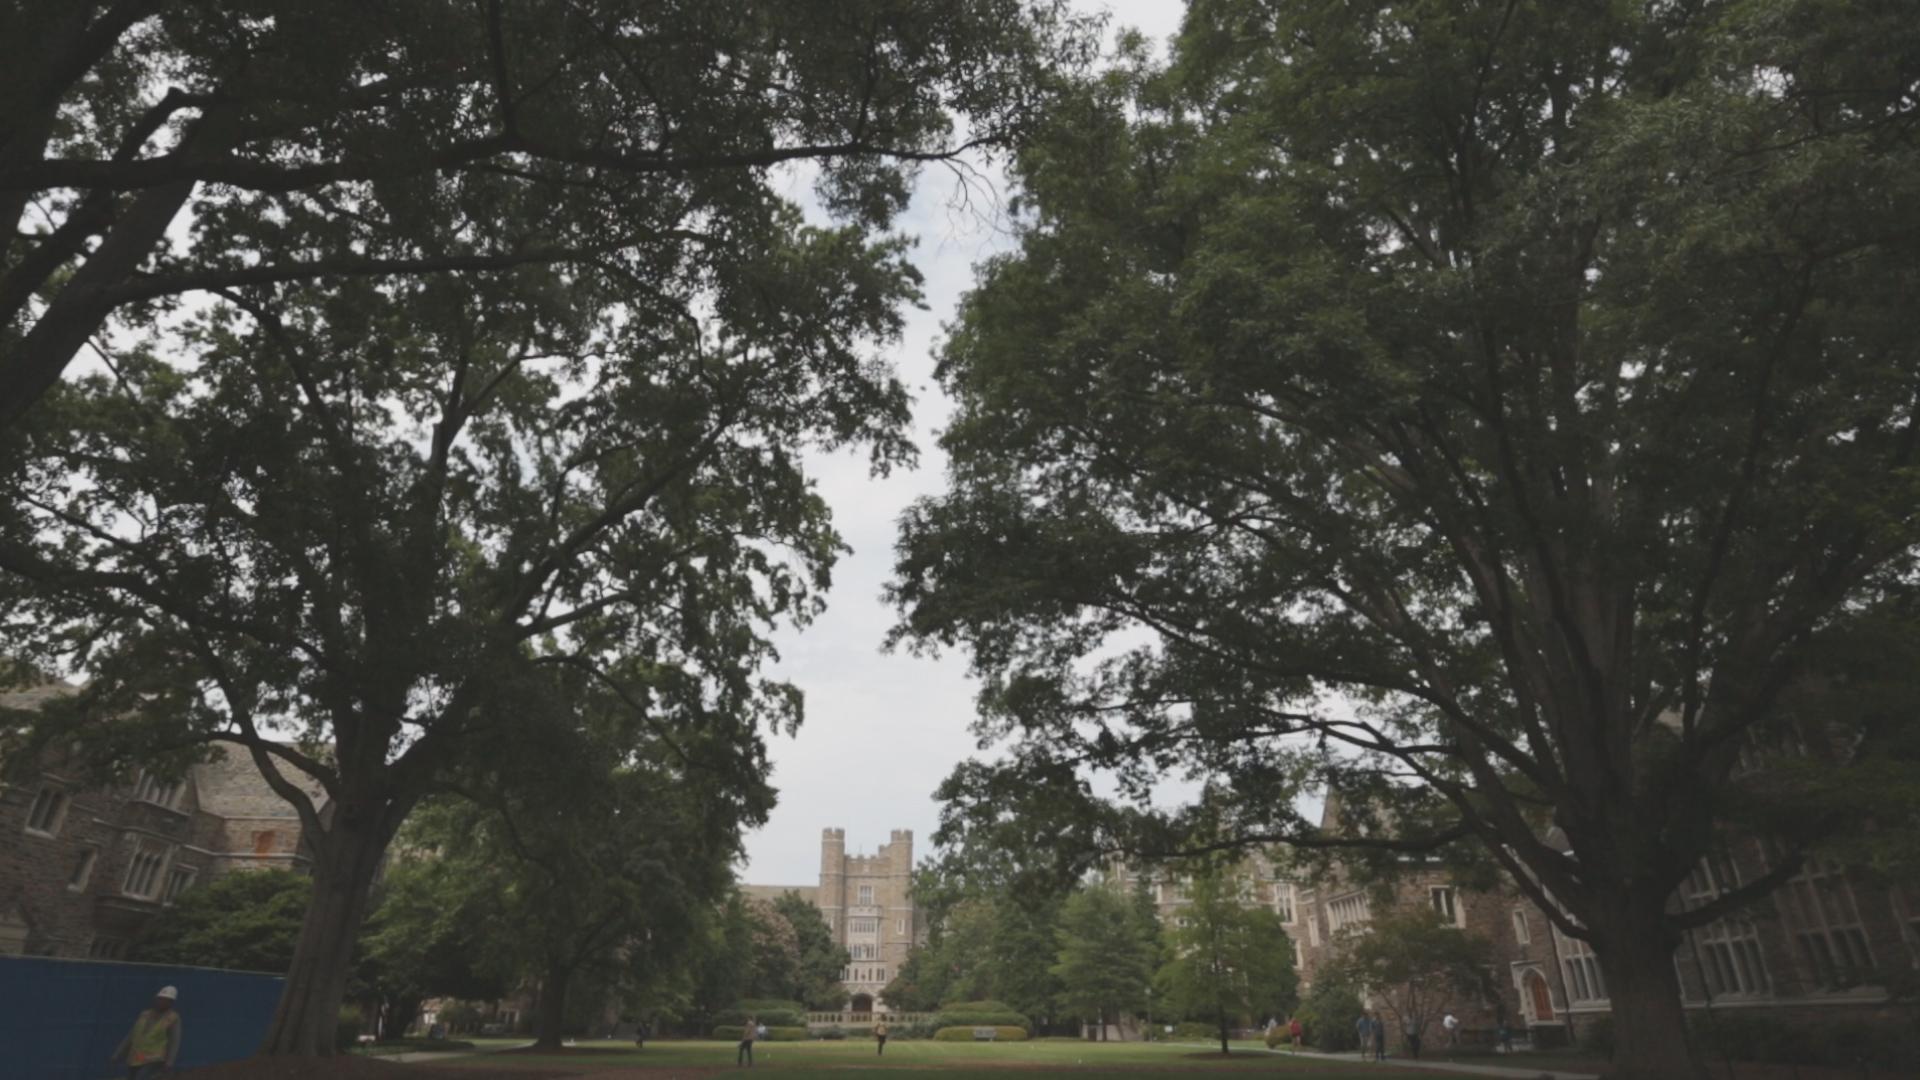 Beautiful old oak trees engulf Duke University's campus quad in Durham, North Carolina